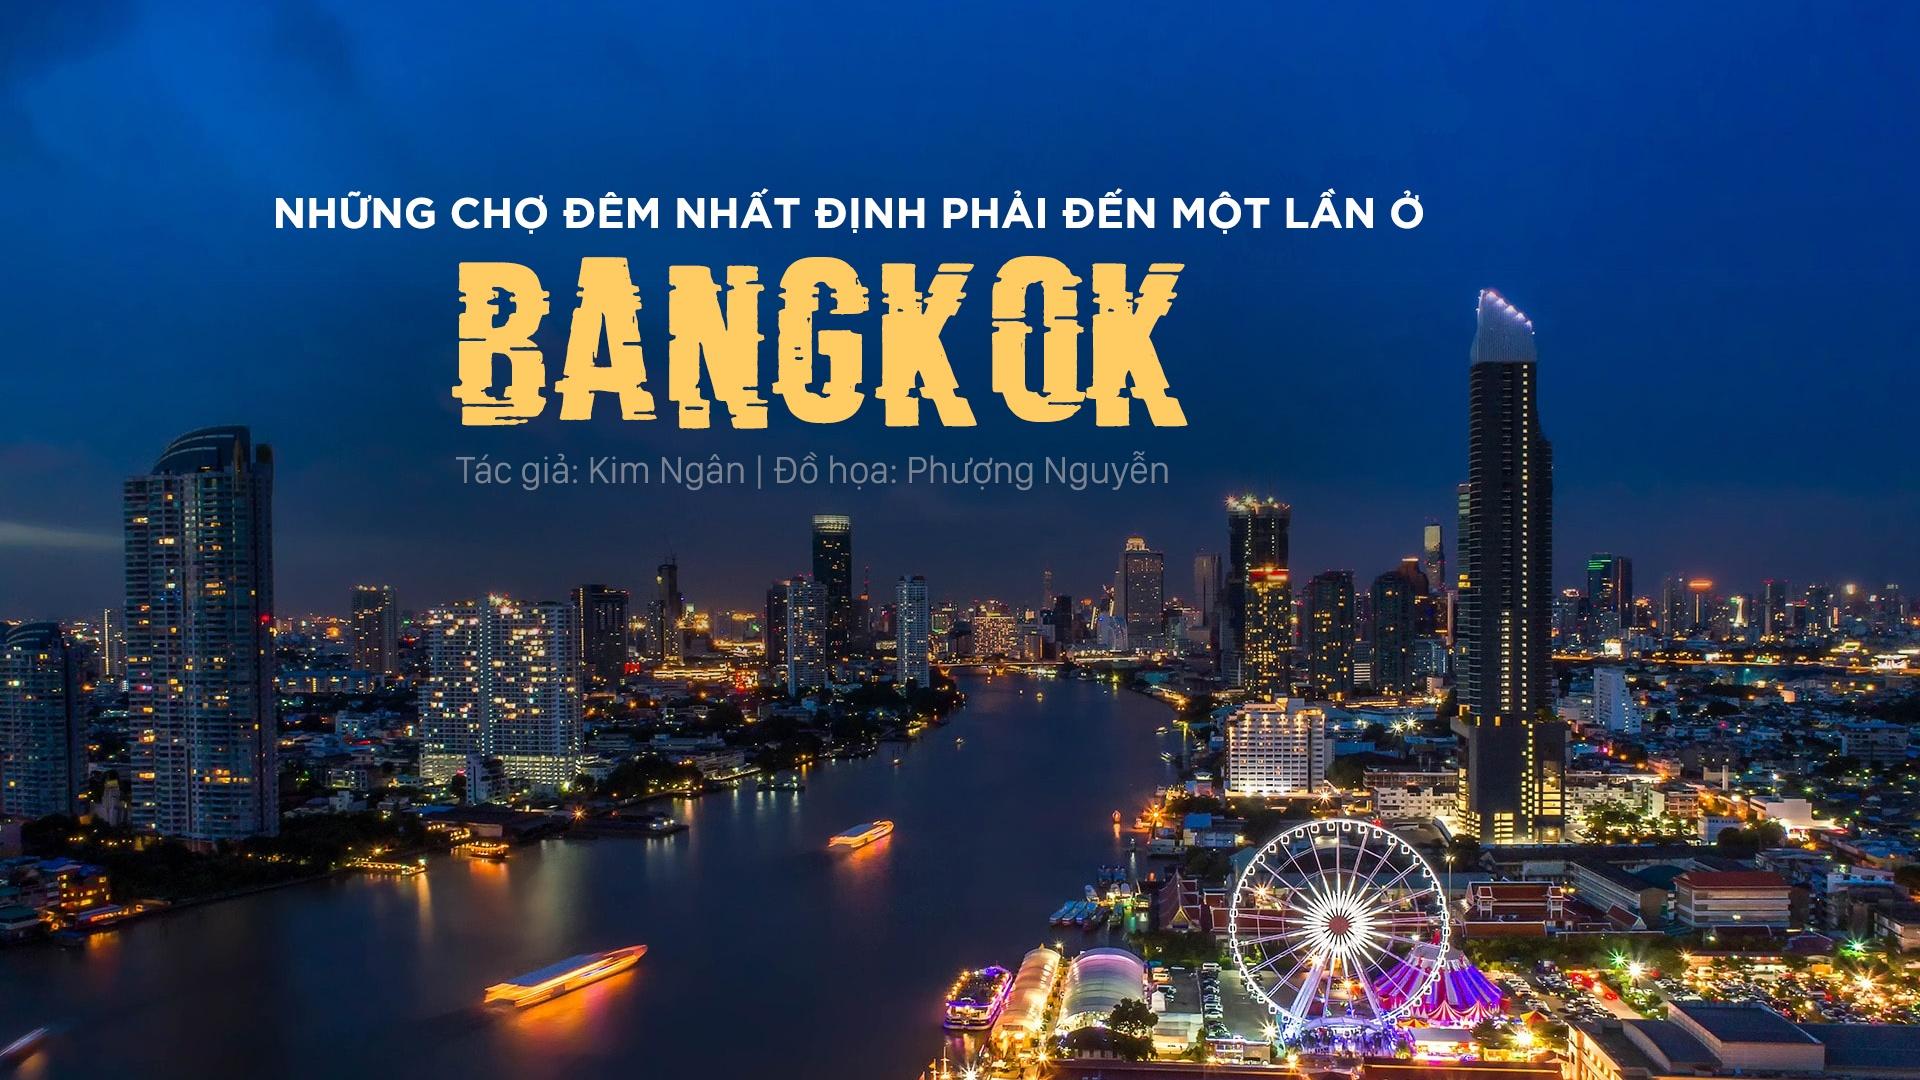 7 khu cho dem khien ban mai me quen loi ve o Bangkok hinh anh 1